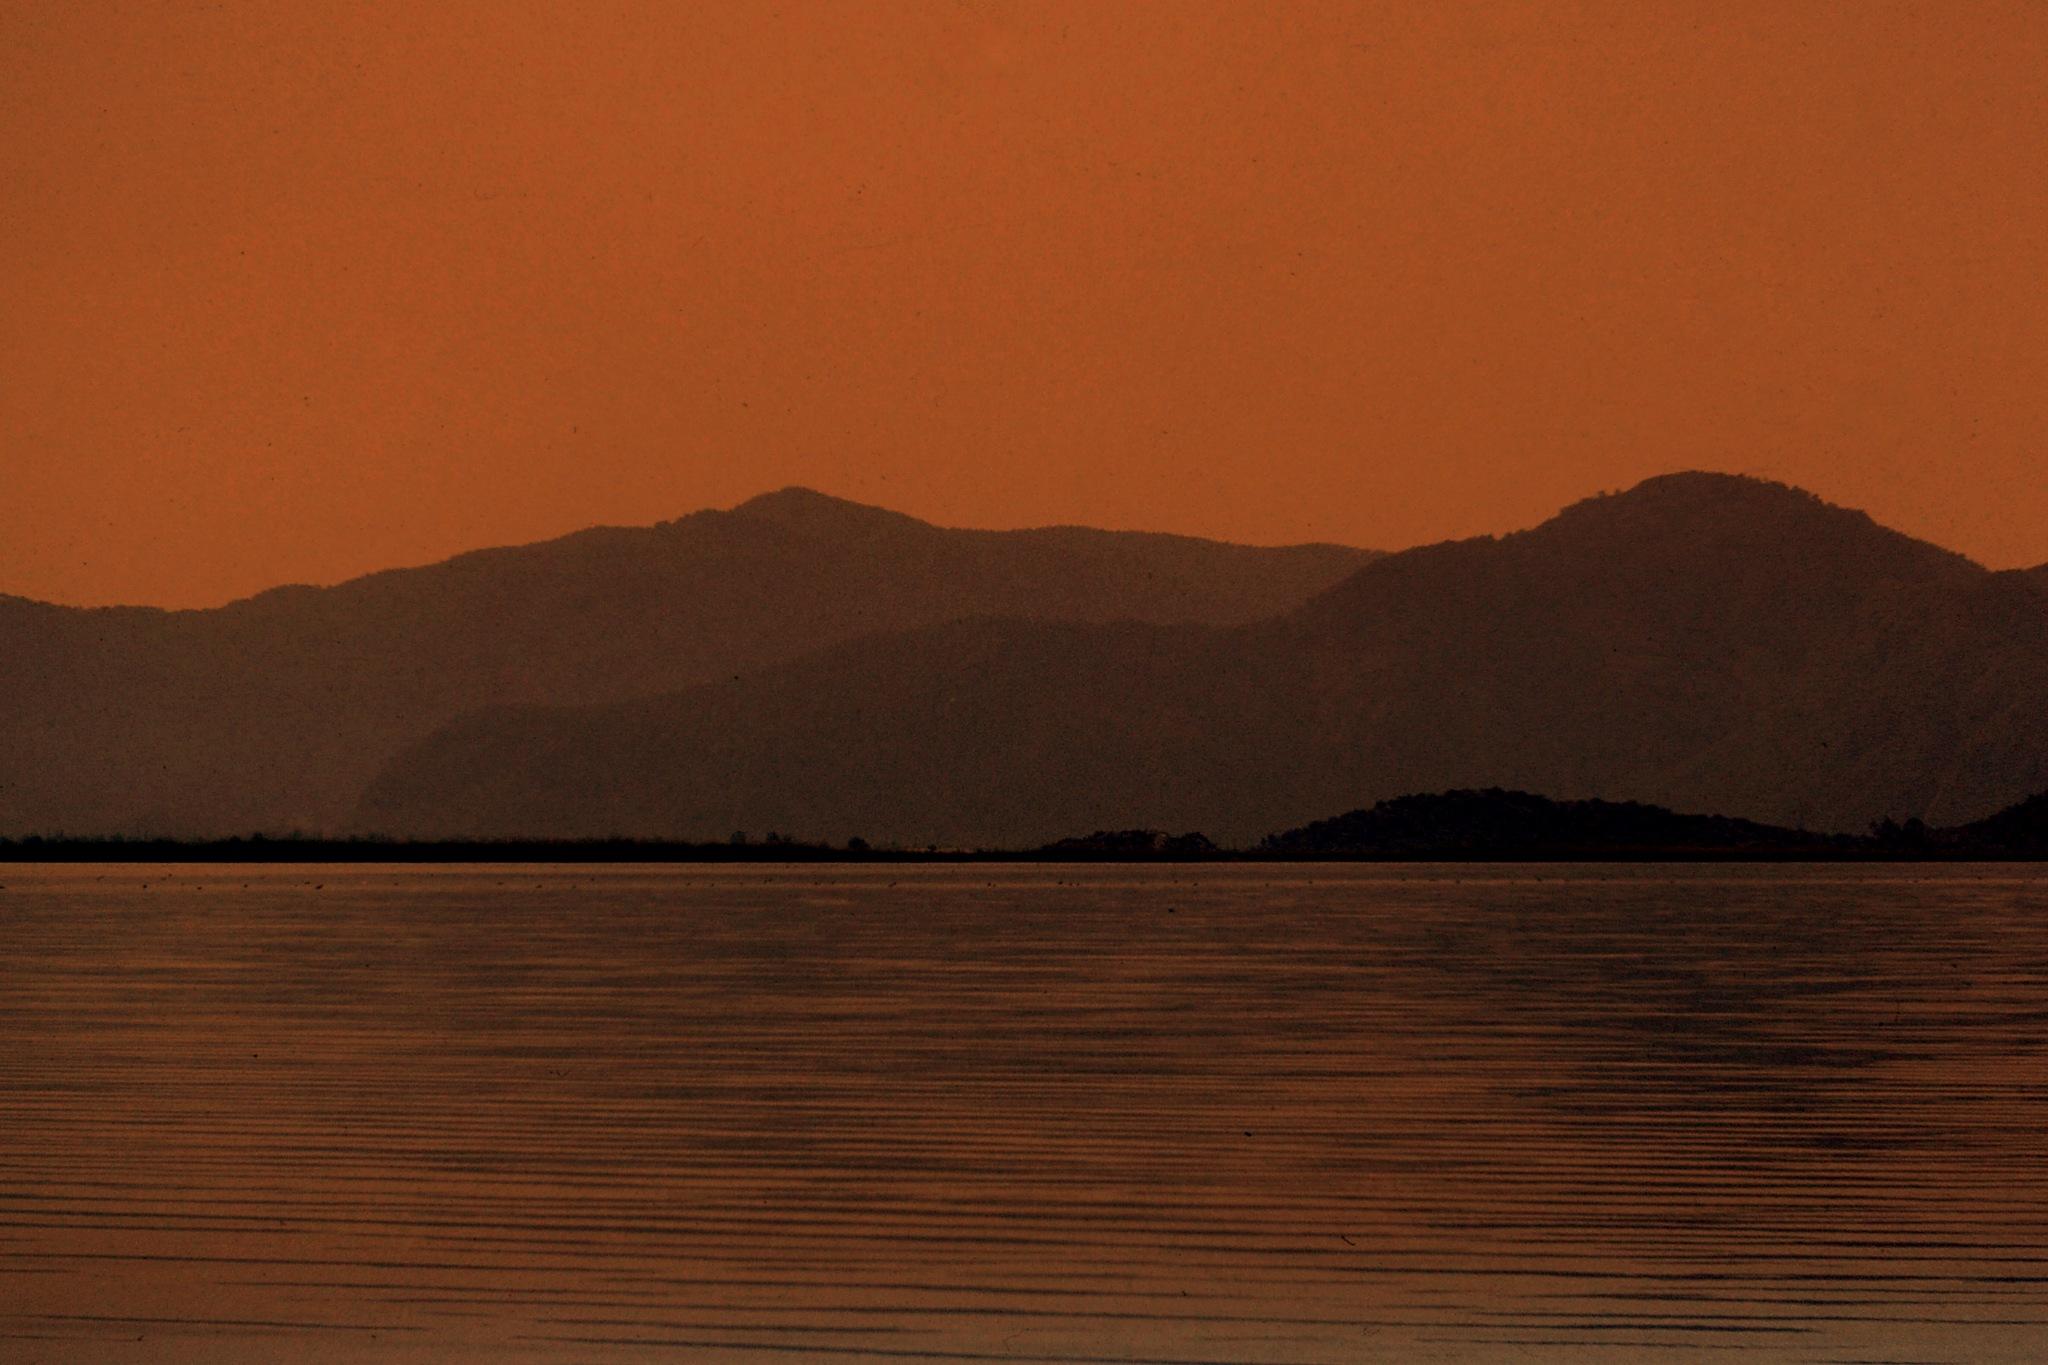 BEAUTIFUL  MEDITERRENEAN COASTS, AFTER SUNSET by Akin Saner